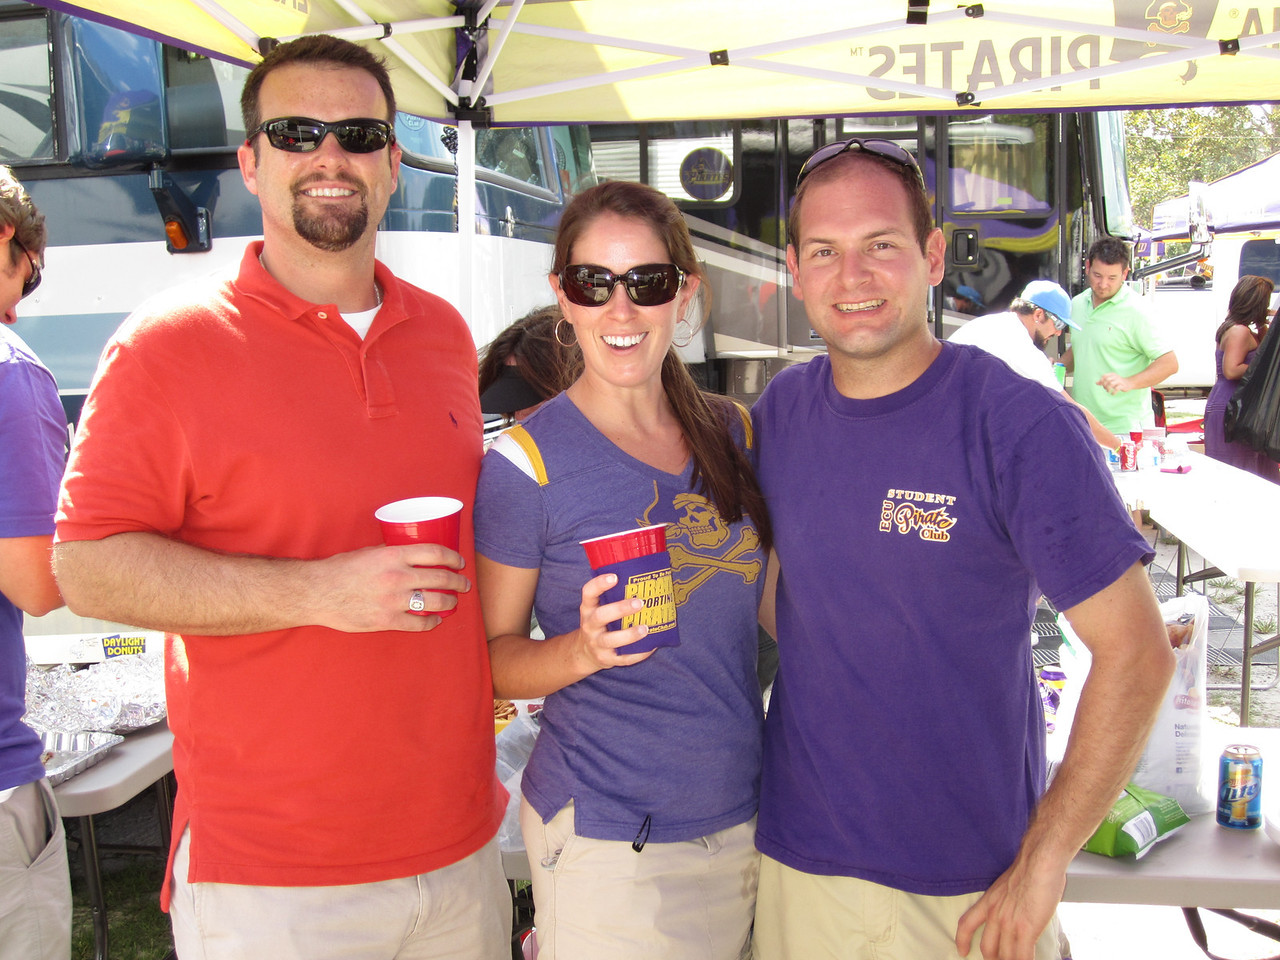 9/10/2011 ECU vs Virginia Tech  Chris Shoup, Beth Shoup, Jon Deutsch